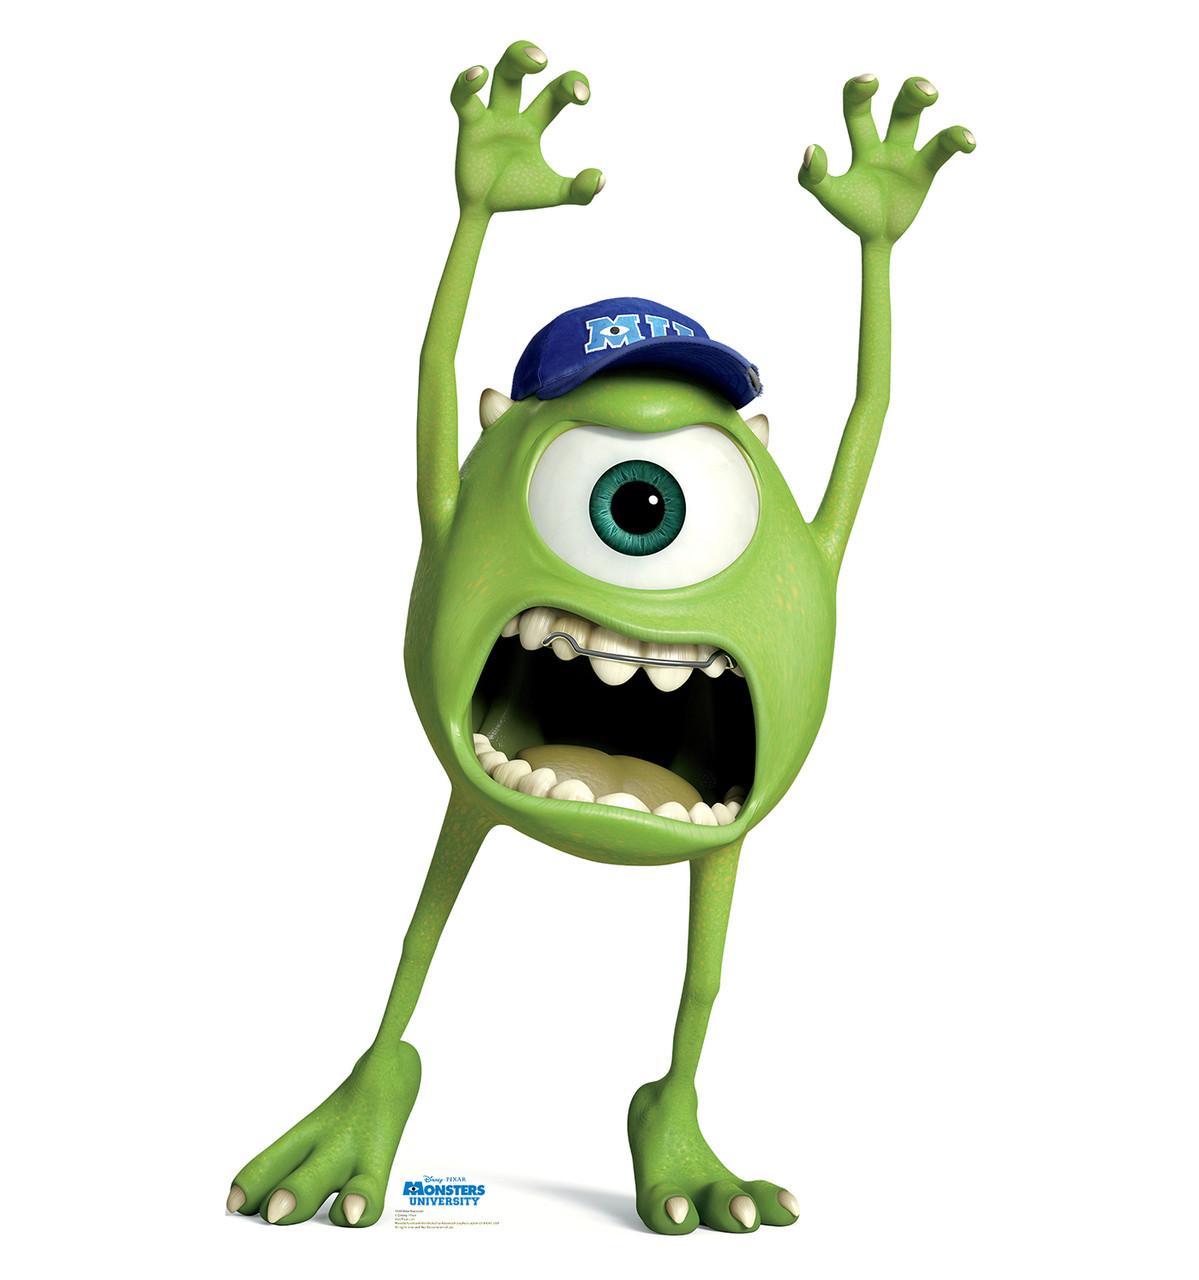 Uncategorized Mike Wazowski life size mike wazowski disney pixars monsters university university